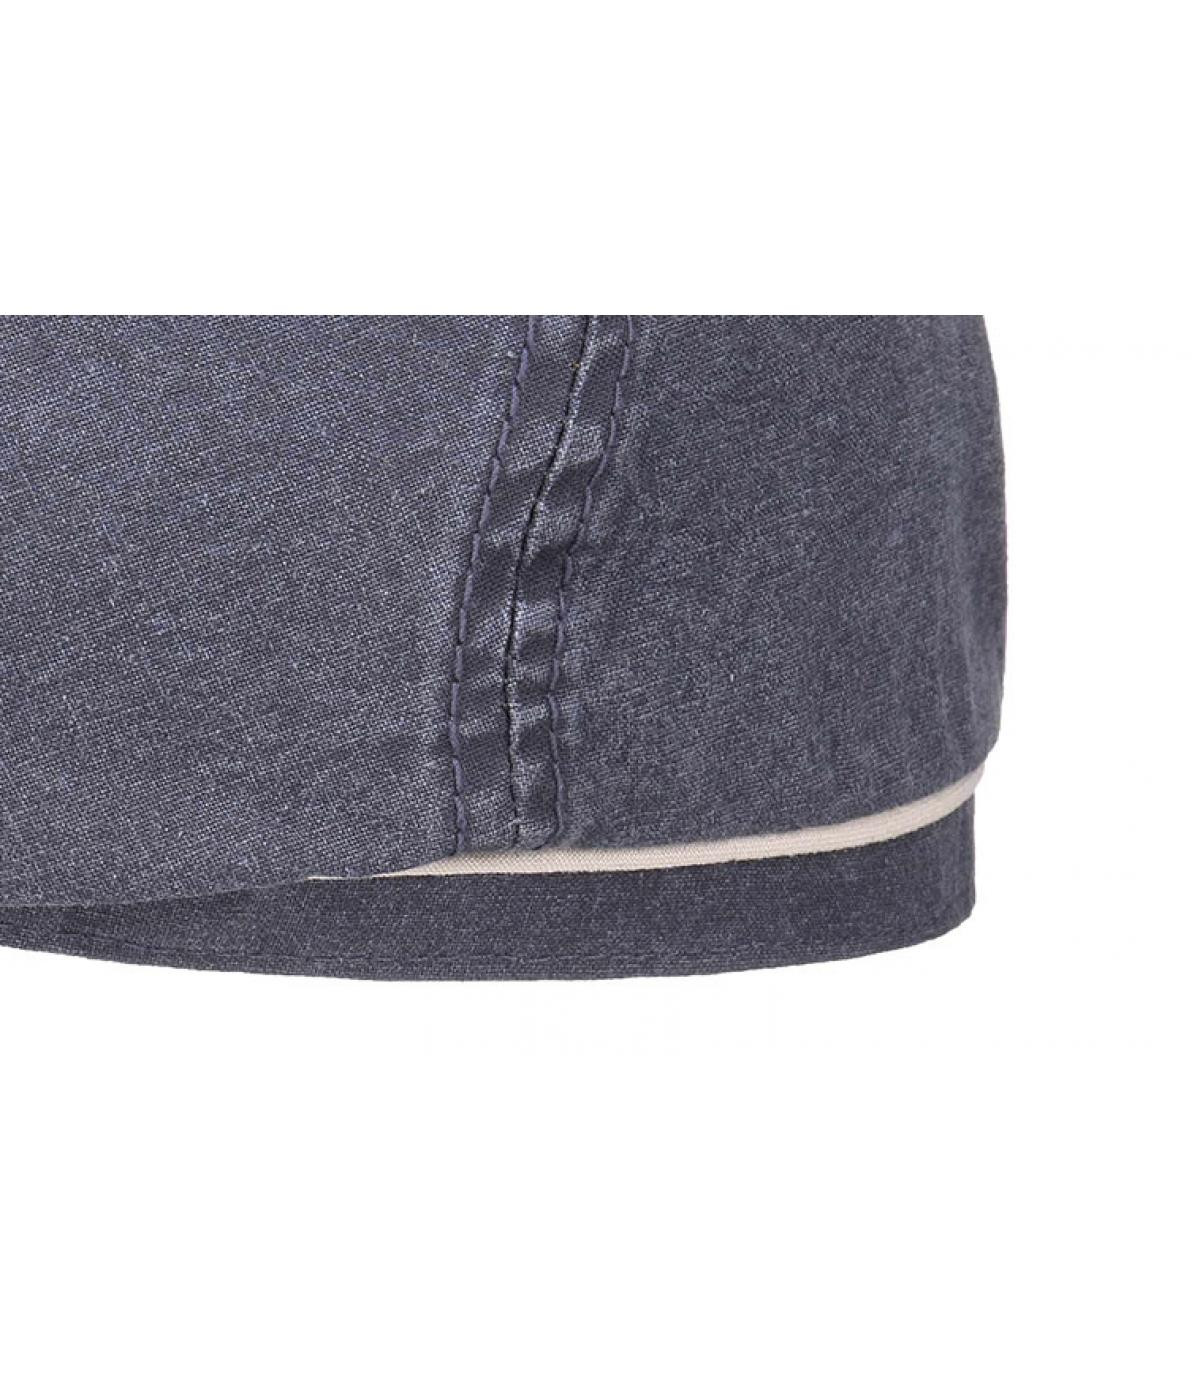 Détails Brooklyn cap waxed cotton organic blue - image 3